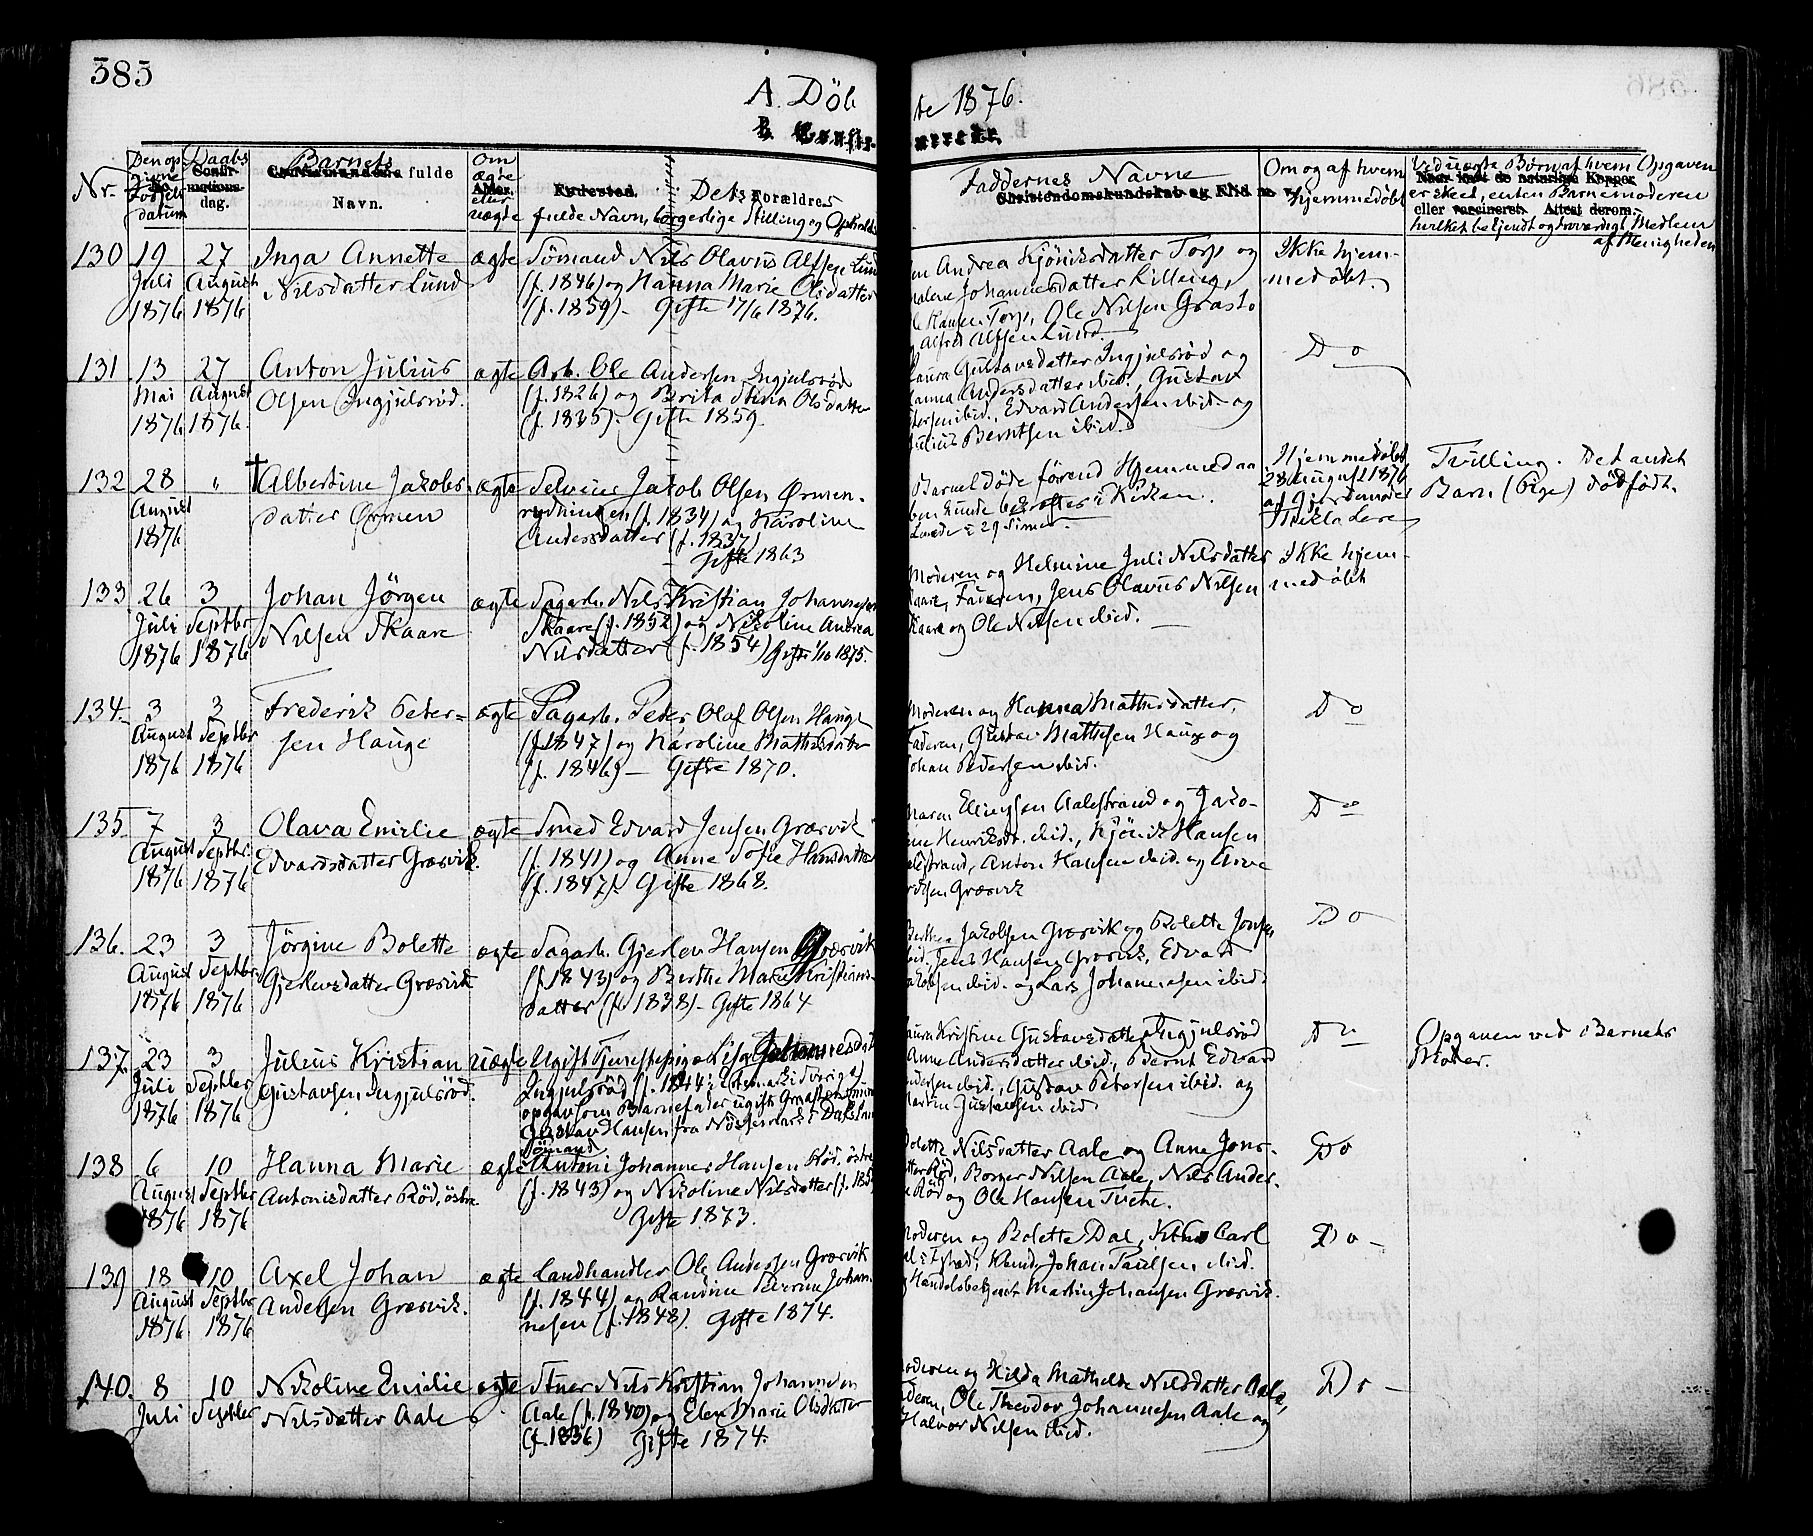 SAO, Onsøy prestekontor Kirkebøker, F/Fa/L0004: Ministerialbok nr. I 4, 1861-1877, s. 385